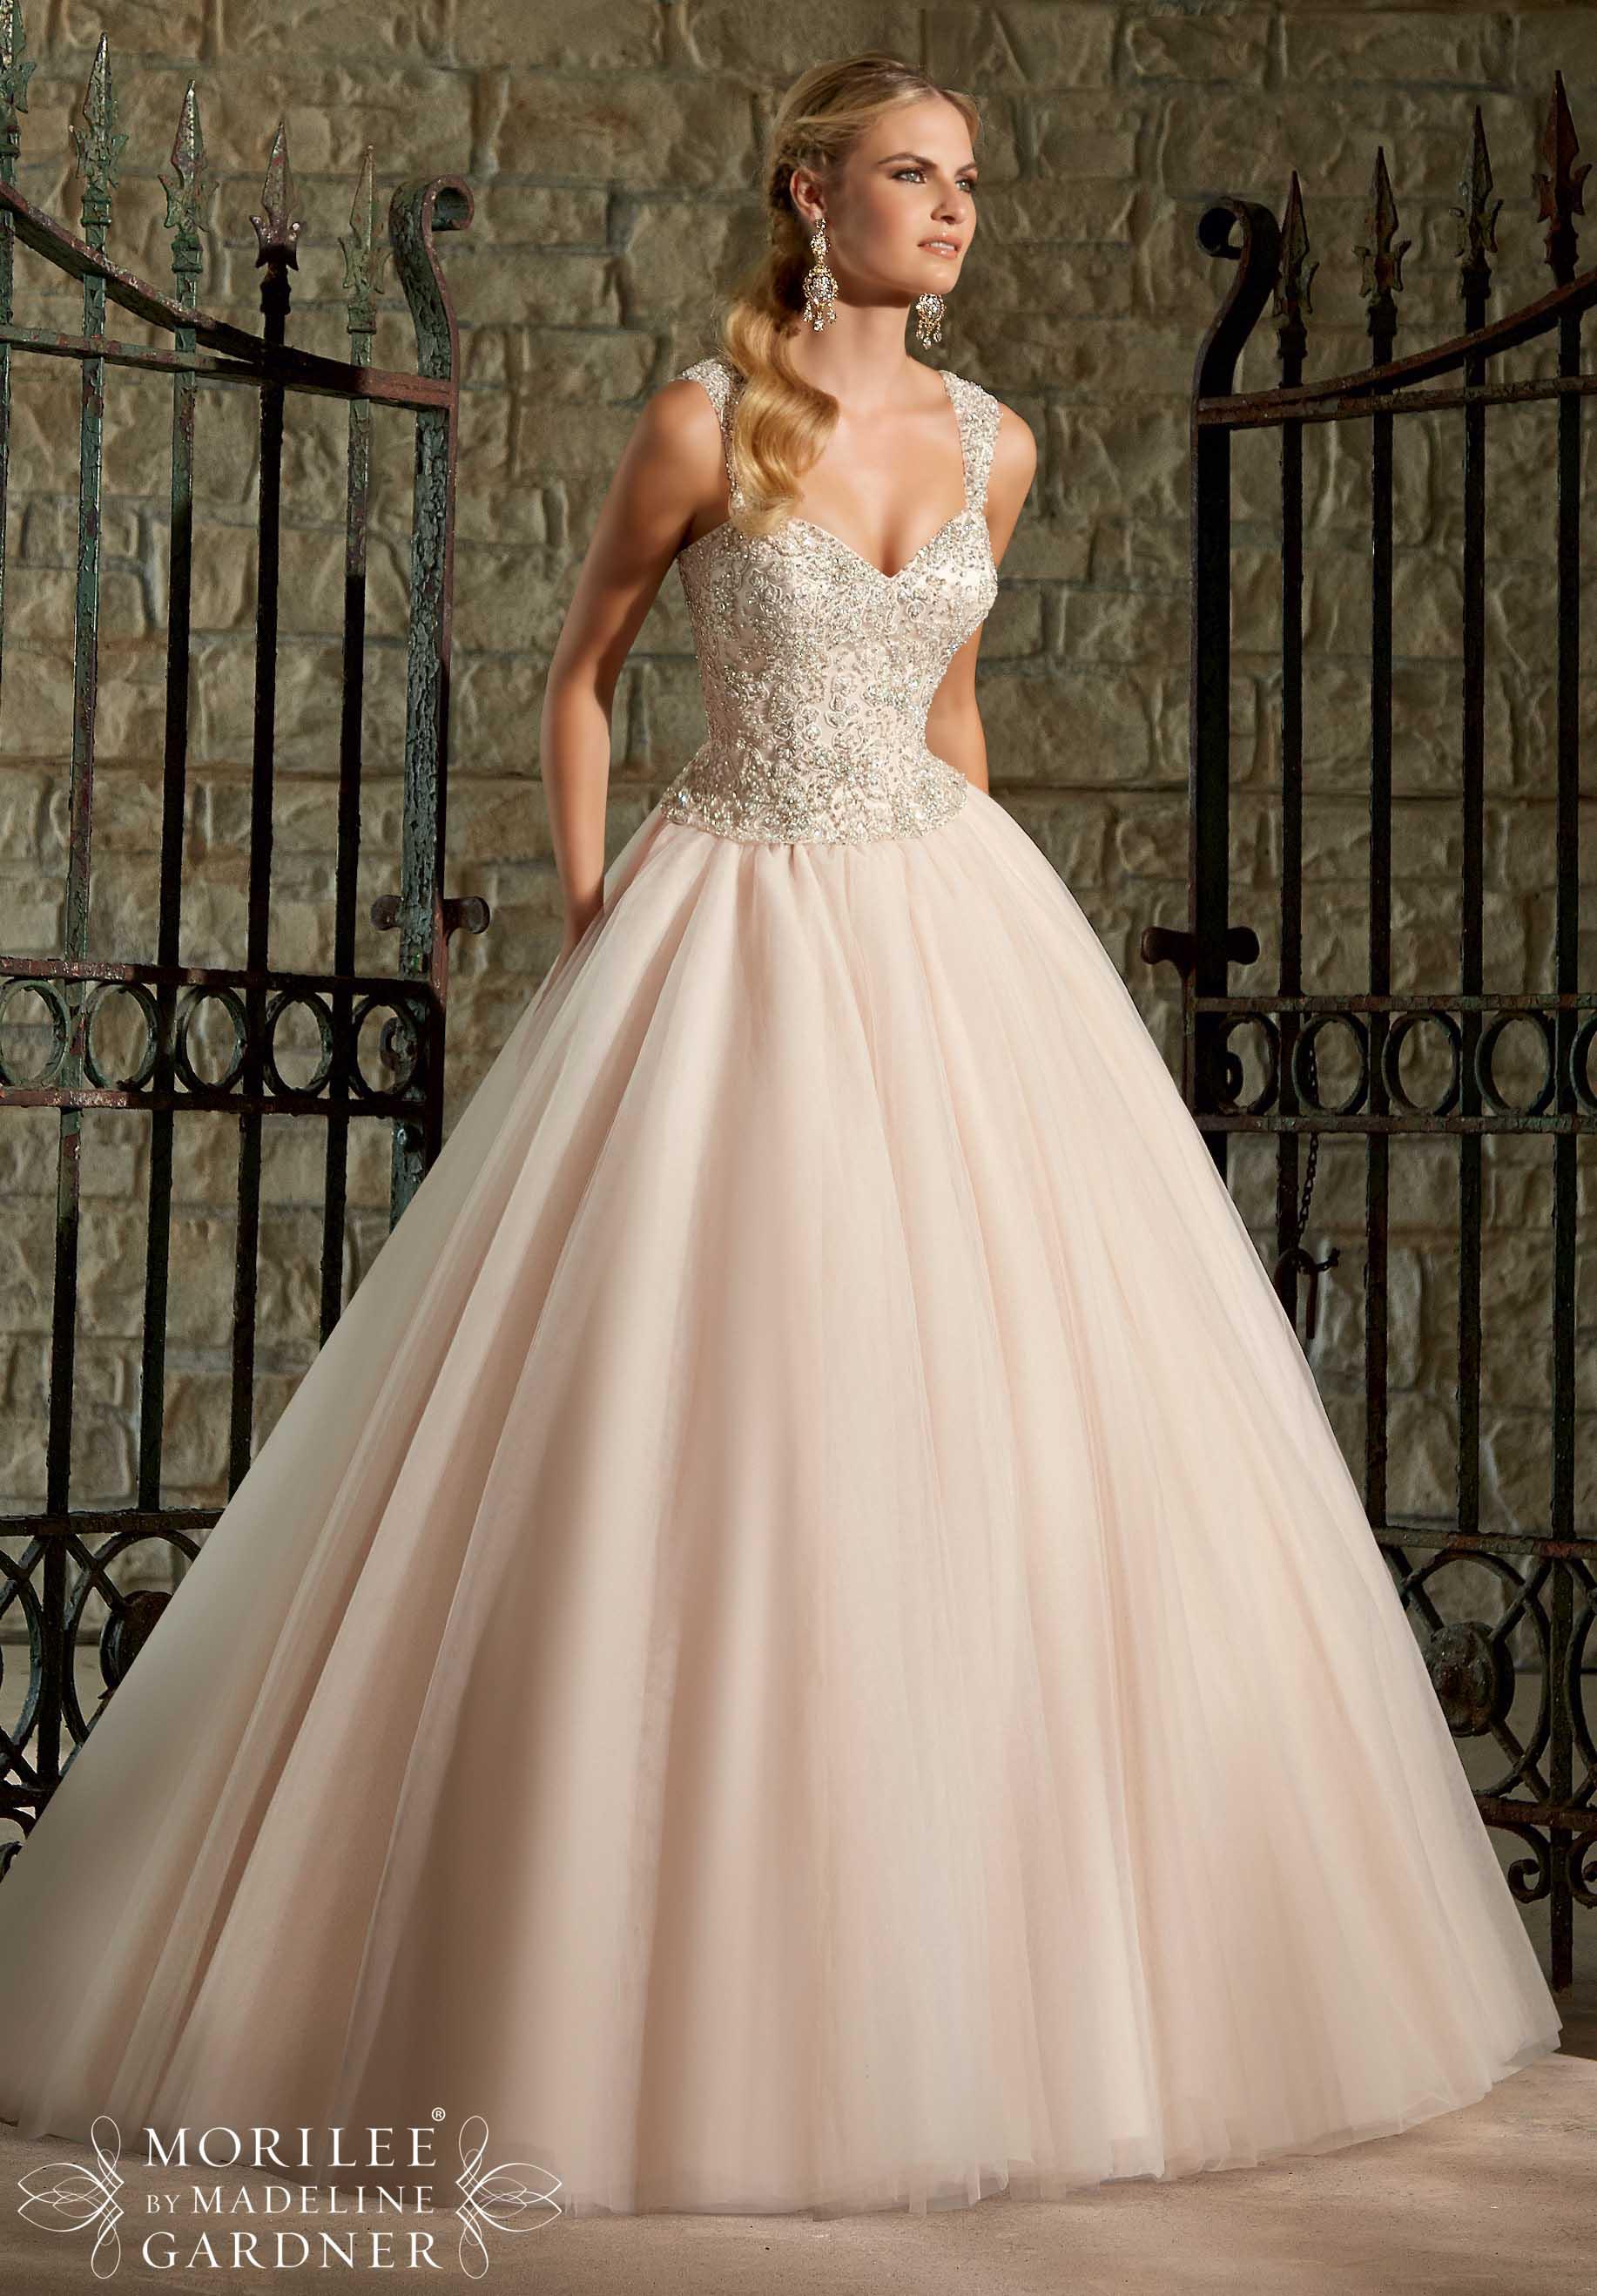 Dress - Mori Lee Bridal SPRING 2015 Collection: 2716